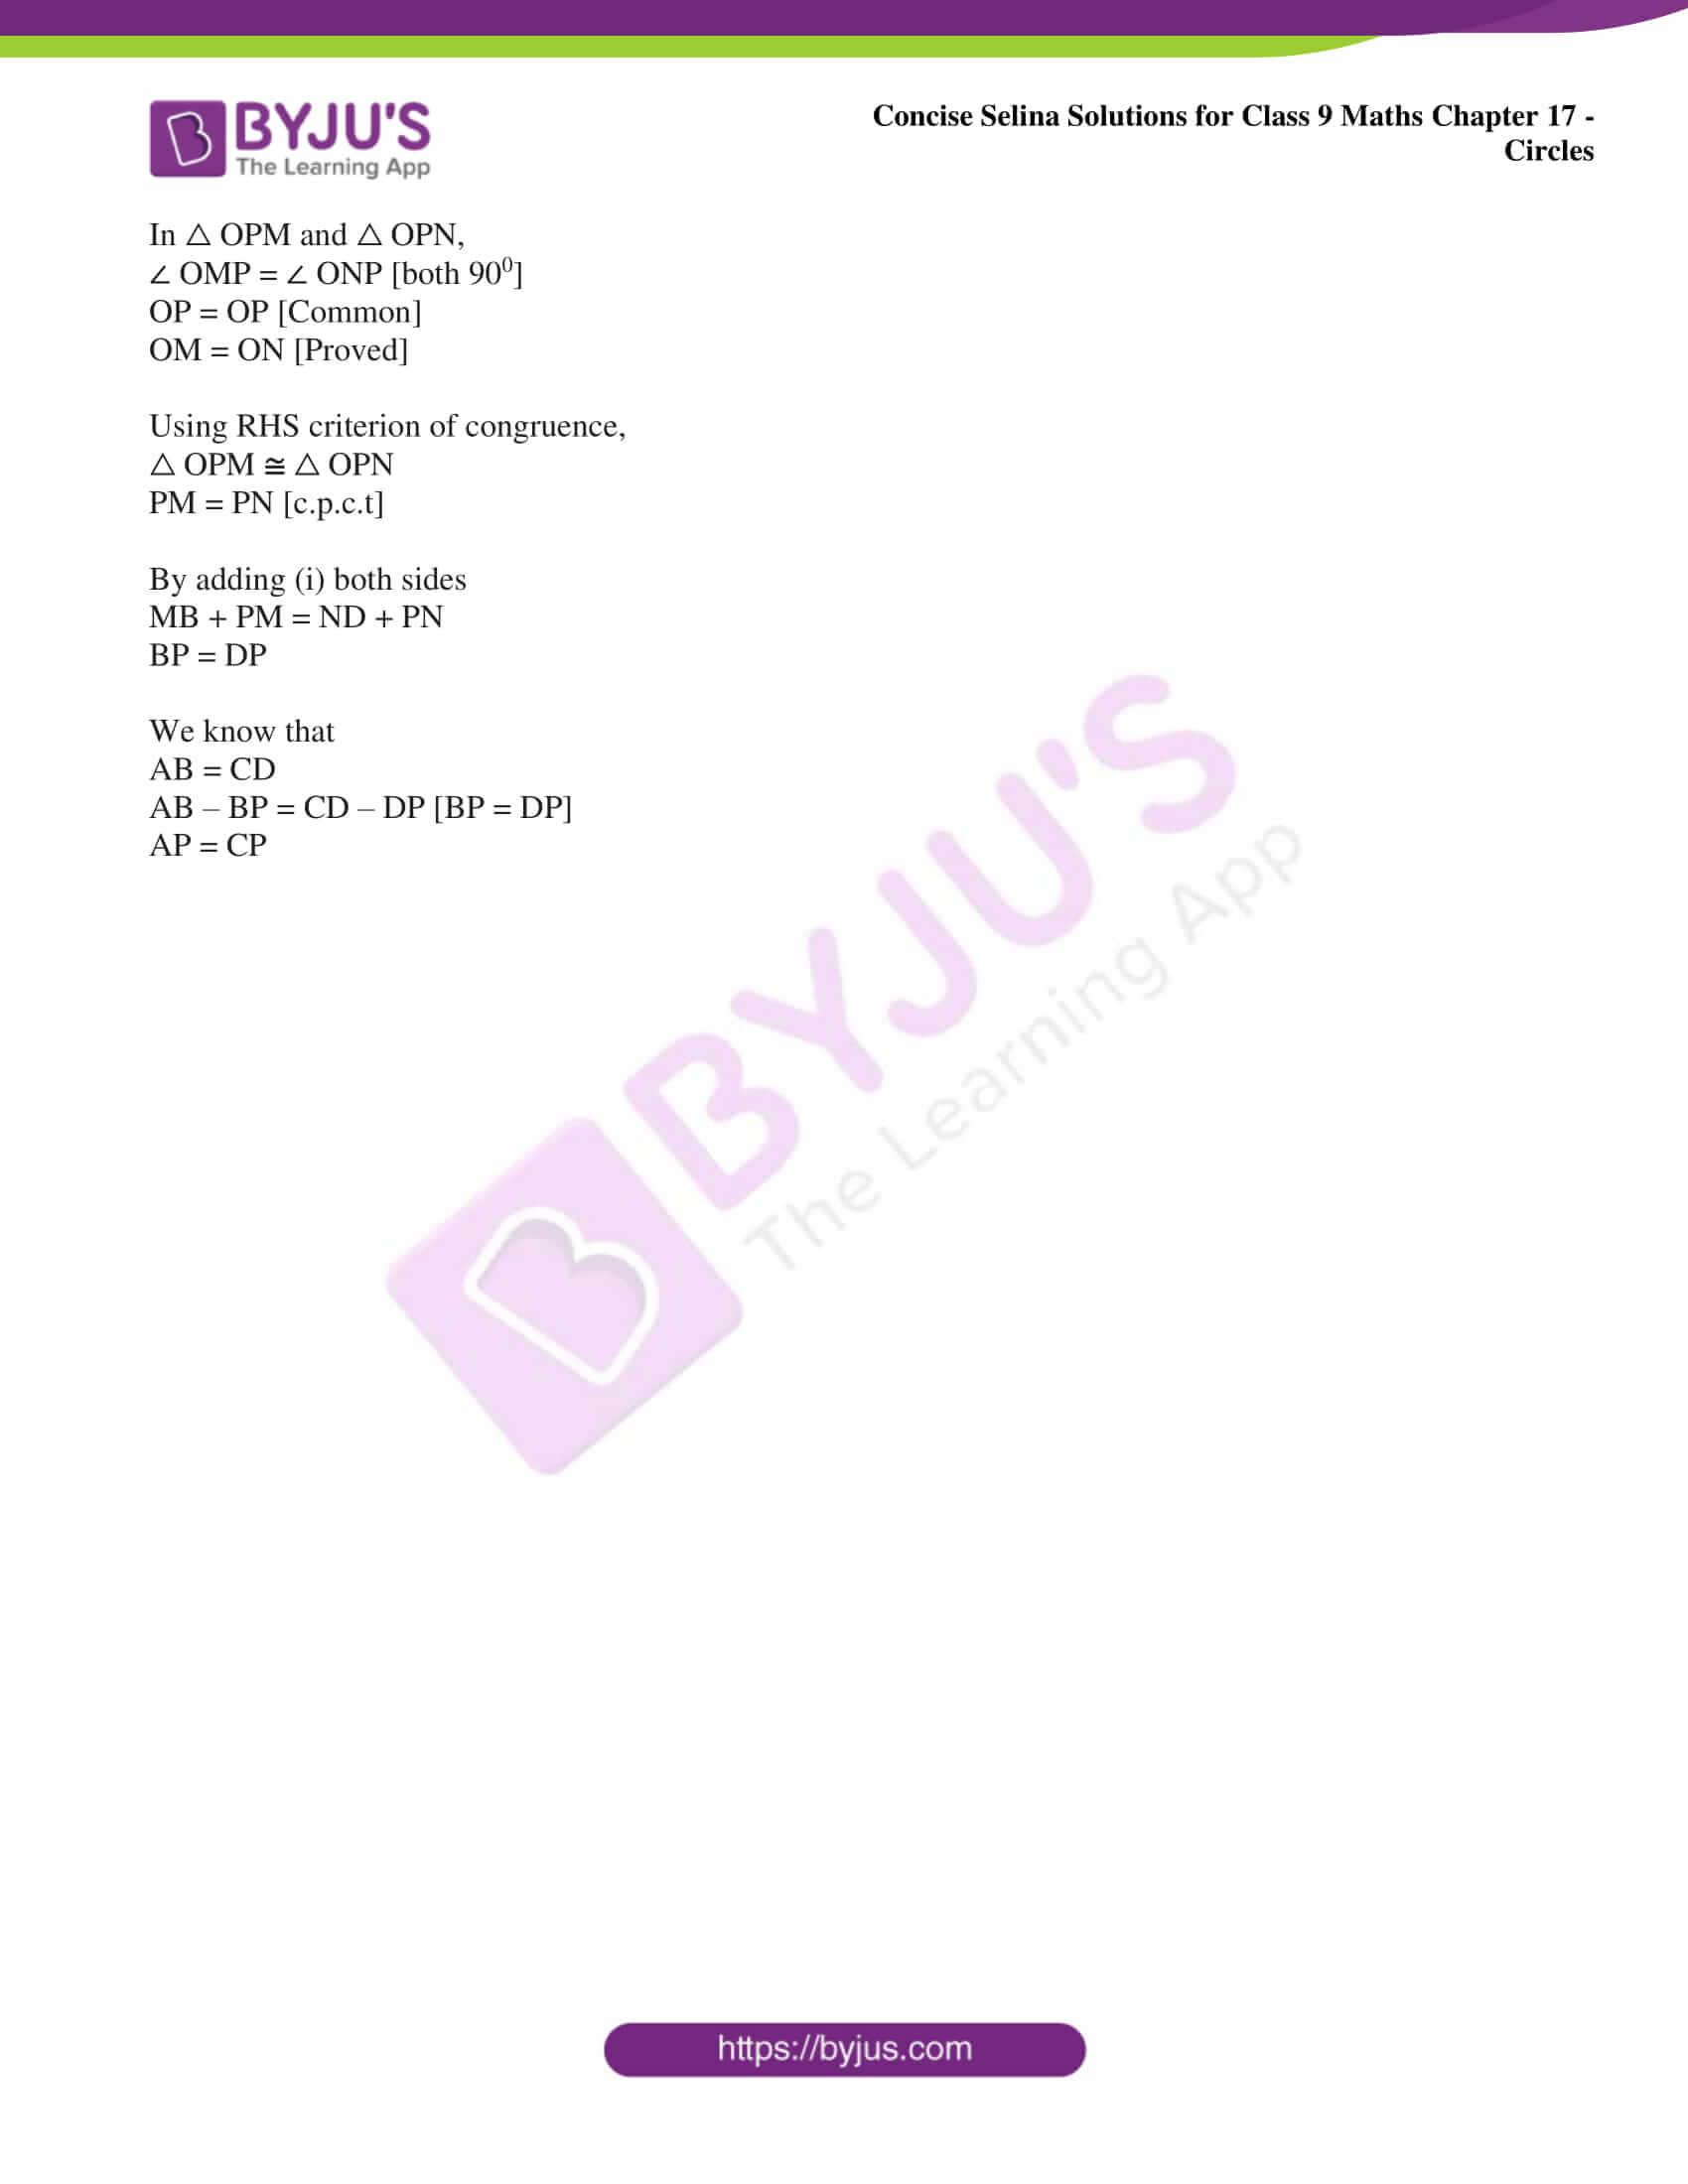 icse class 9 maths may10 selina solutions chapter 17 circles 12